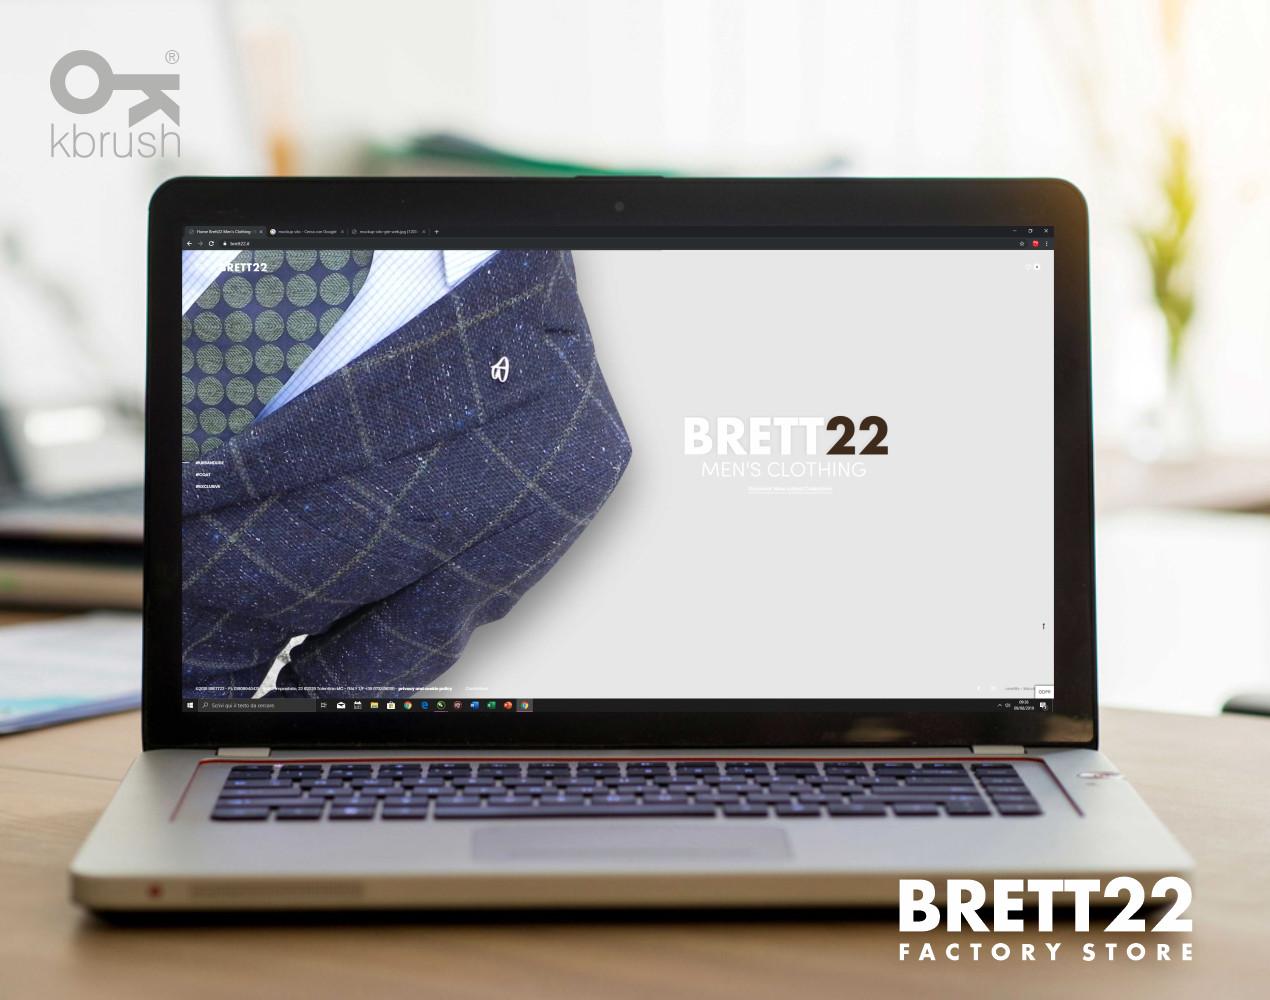 kbrush Studio grafico – Brett22